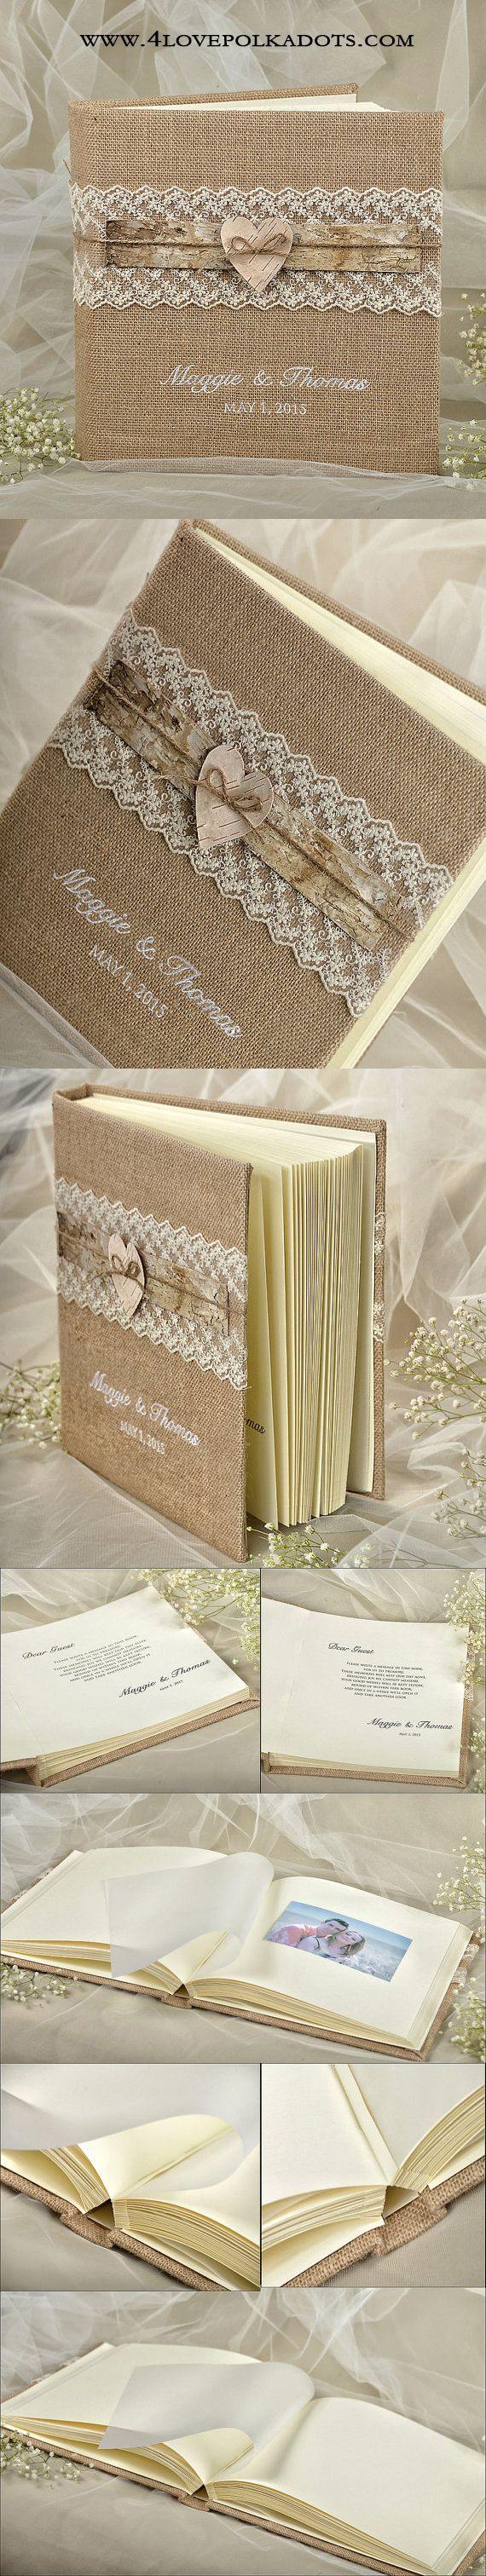 Rustic Wedding Photo Album #weddingideas #countrywedding